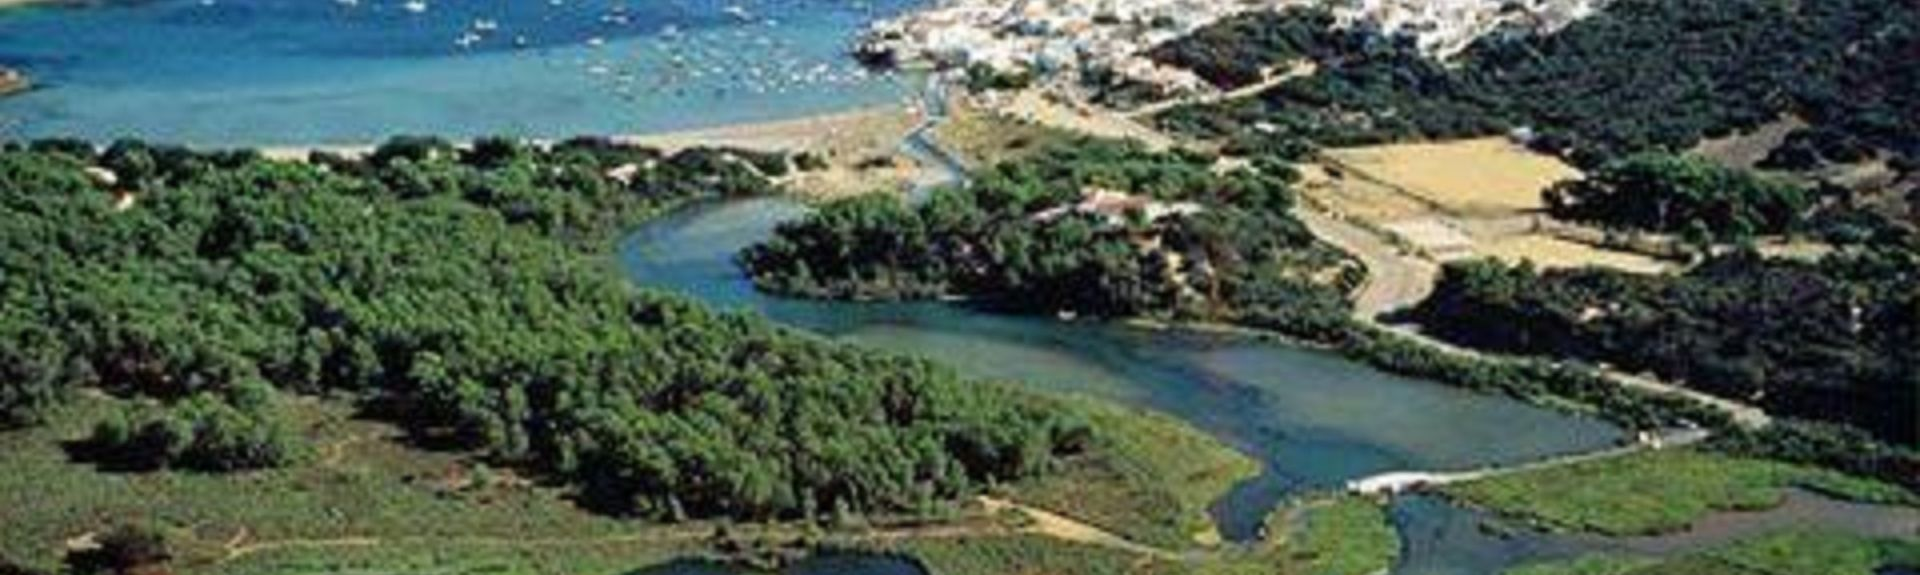 Sant Jaume Mediterrani, Alayor, Balearen, Spanje